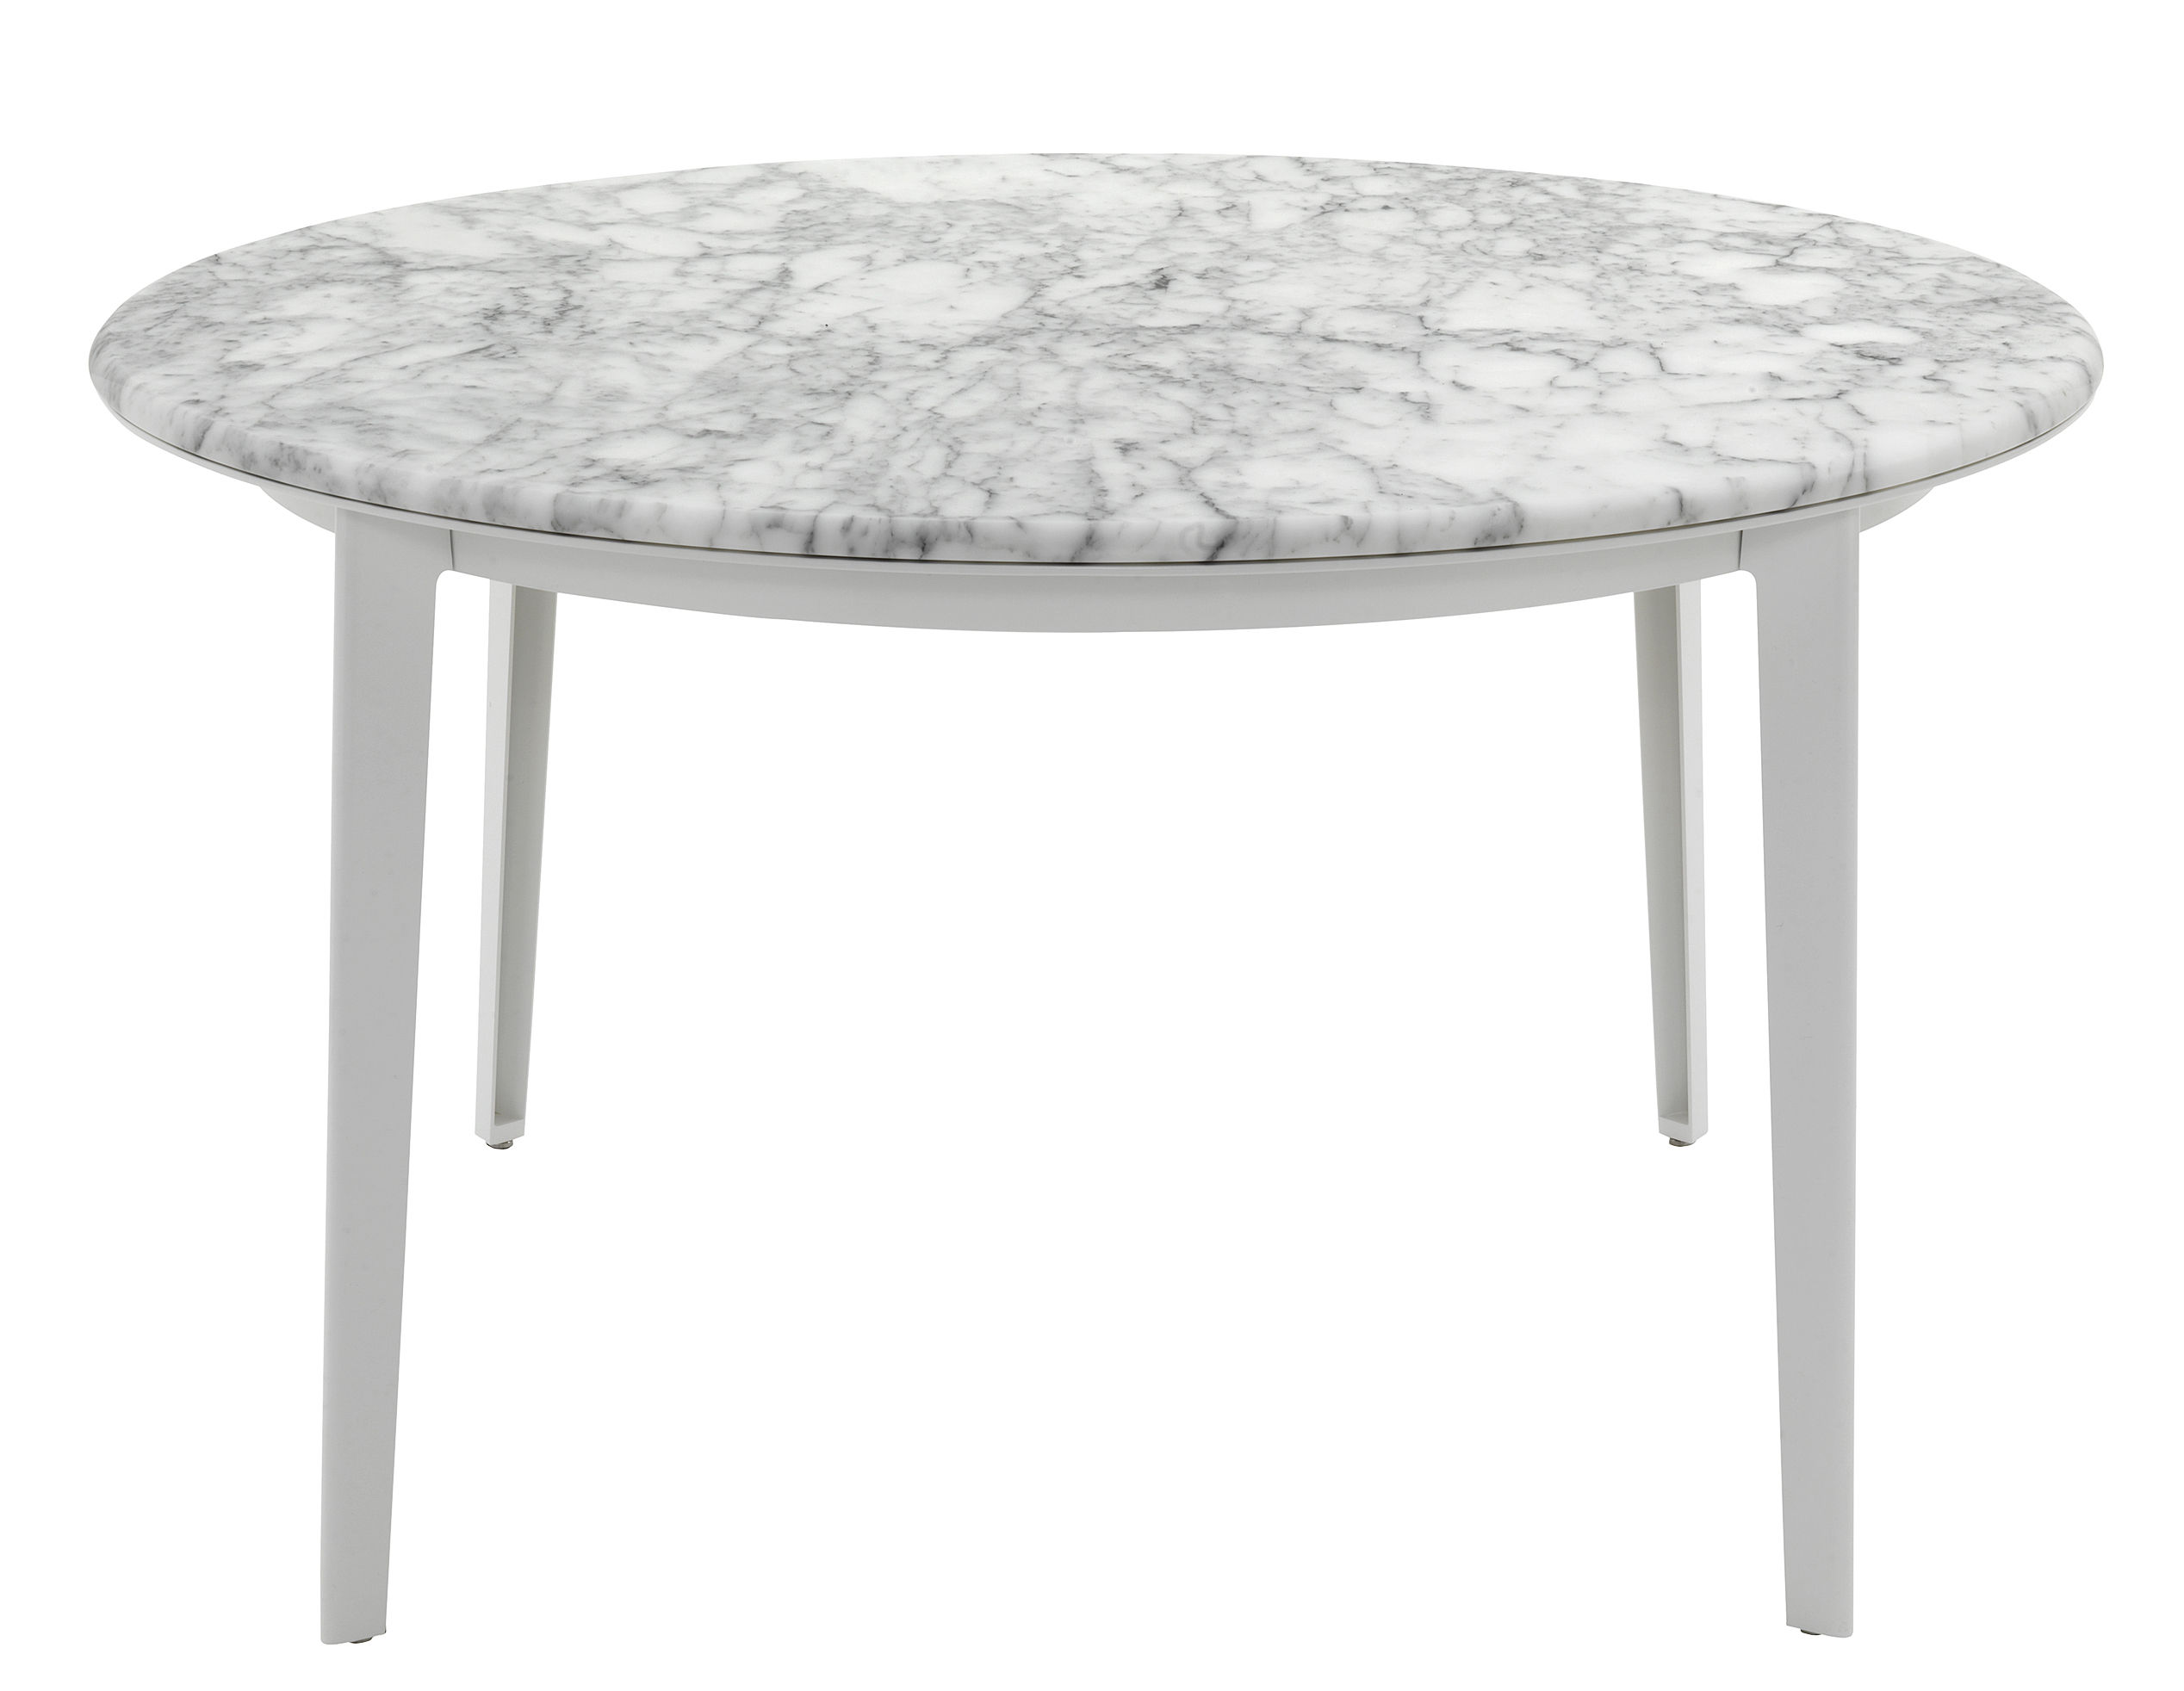 table railway plateau marbre 129 cm plateau en. Black Bedroom Furniture Sets. Home Design Ideas